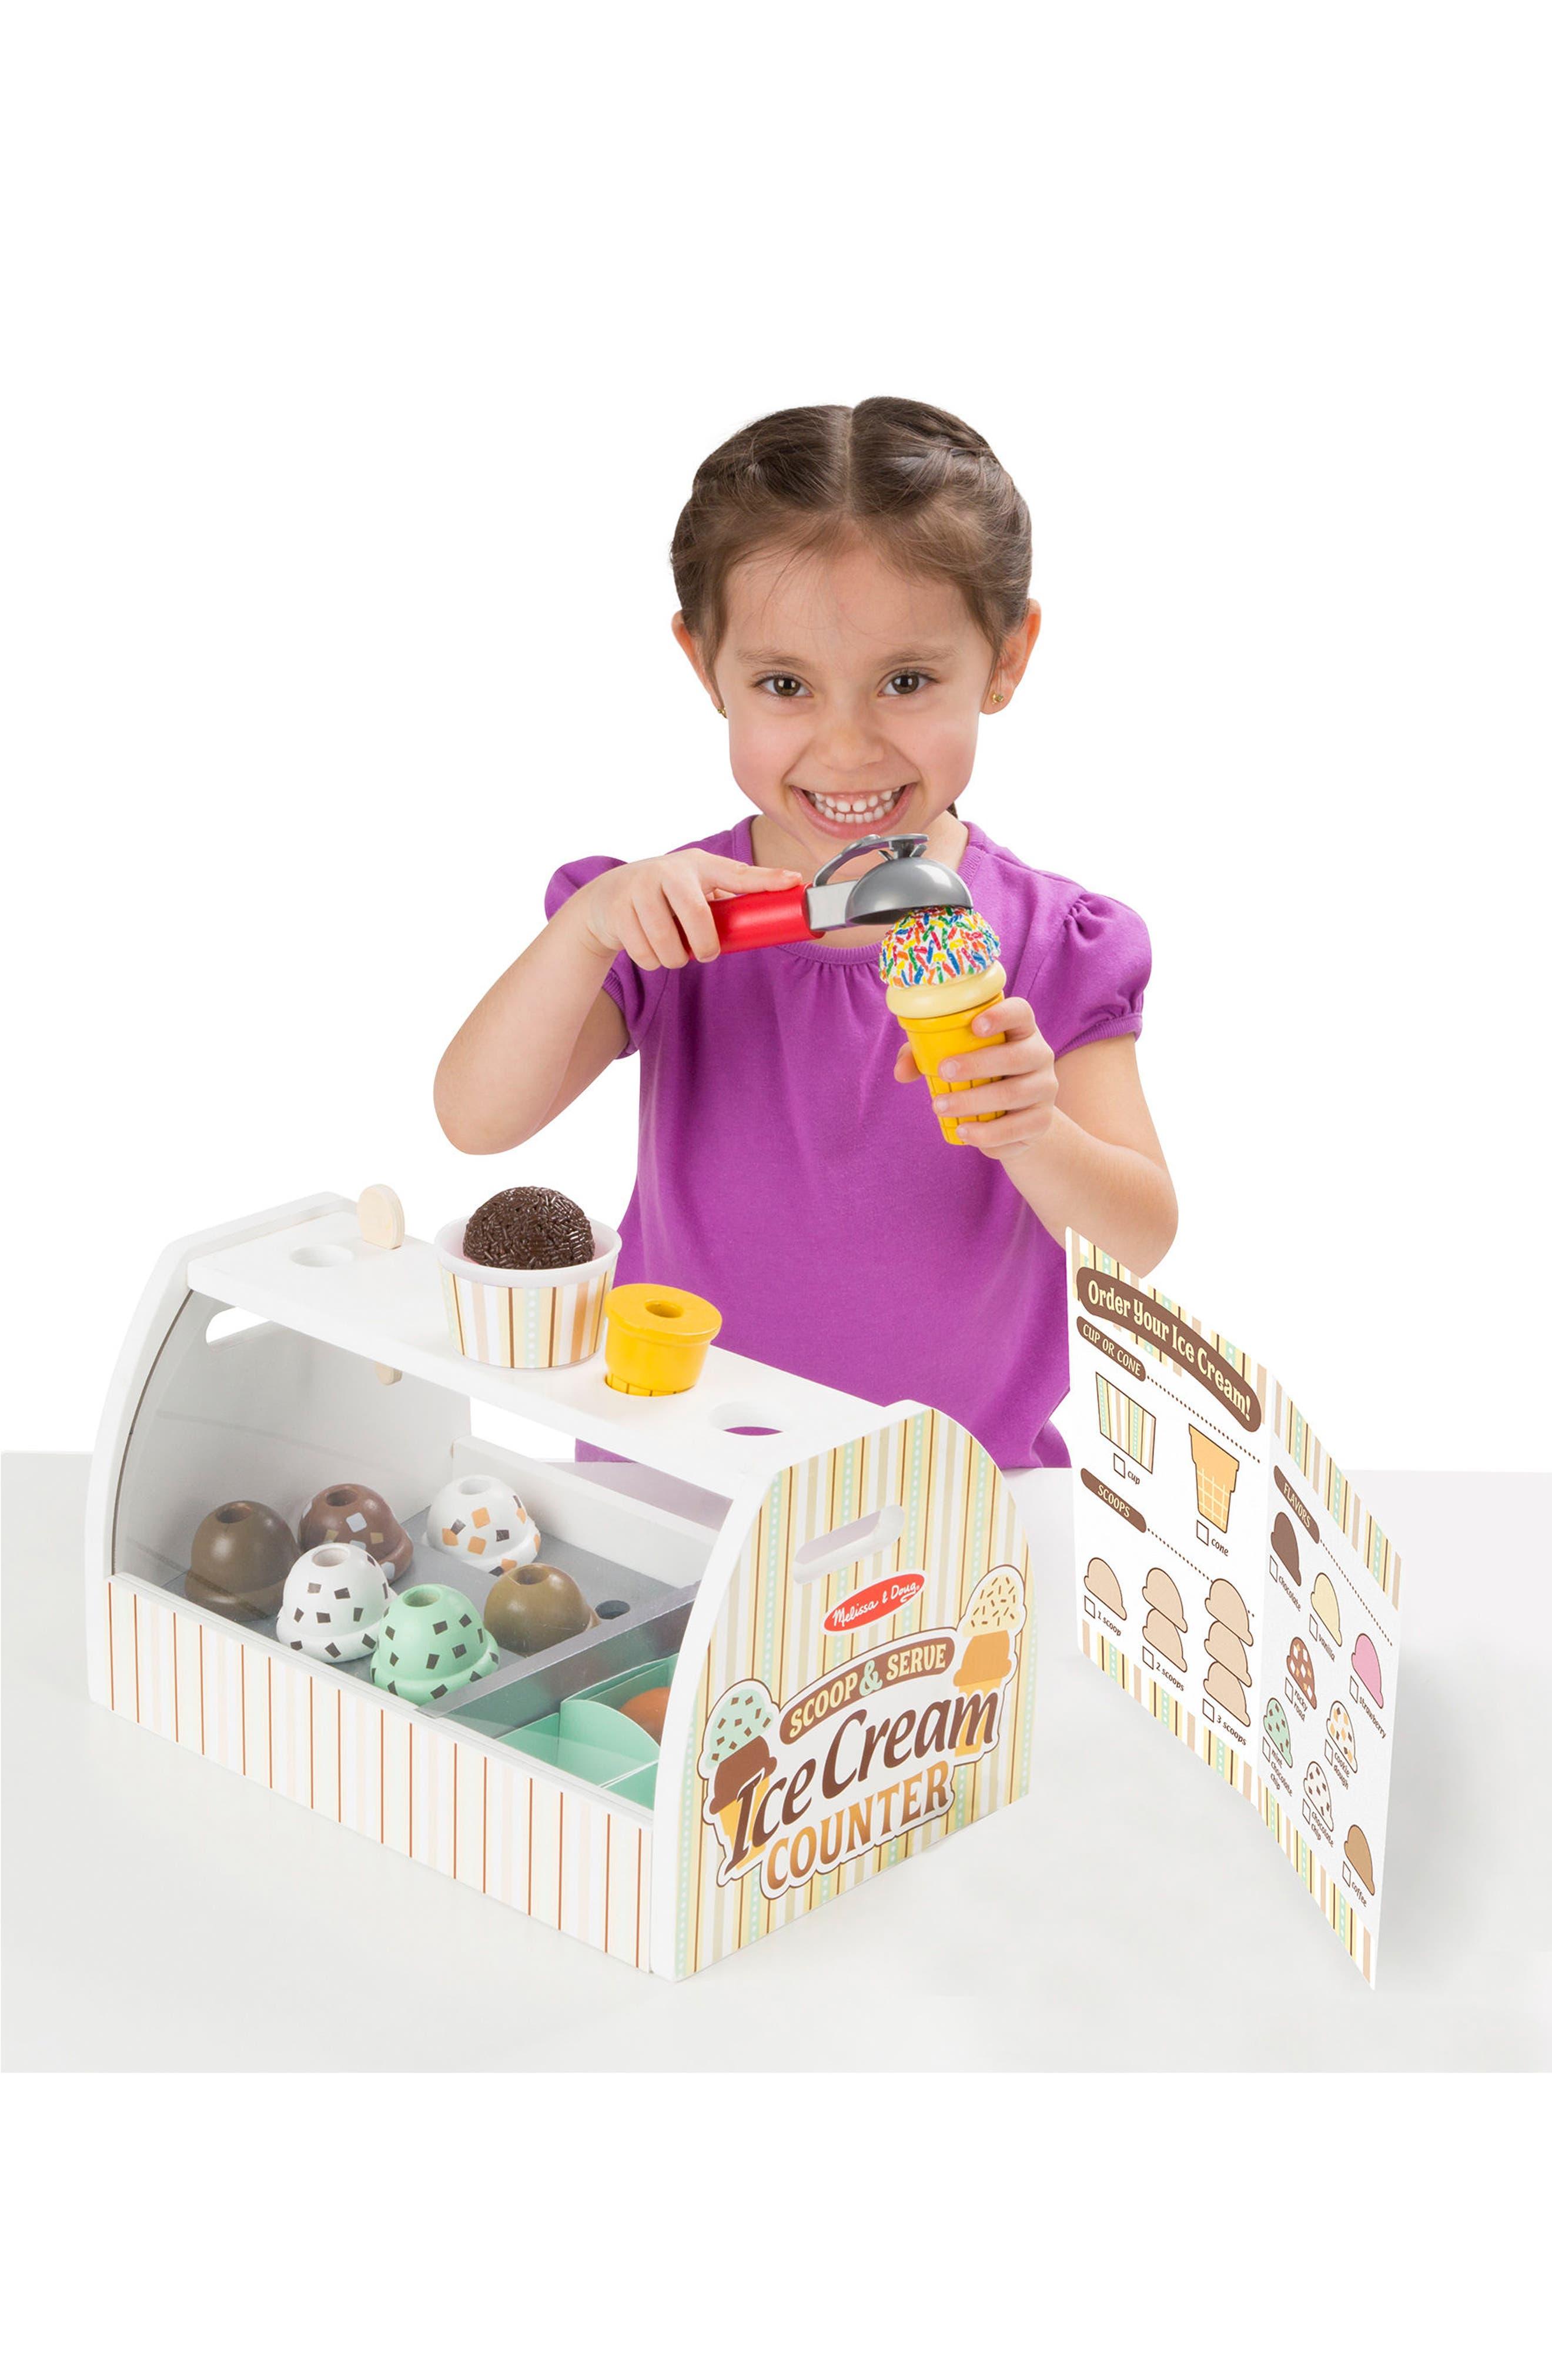 Ice Cream Counter Play Set,                             Alternate thumbnail 3, color,                             MULTI